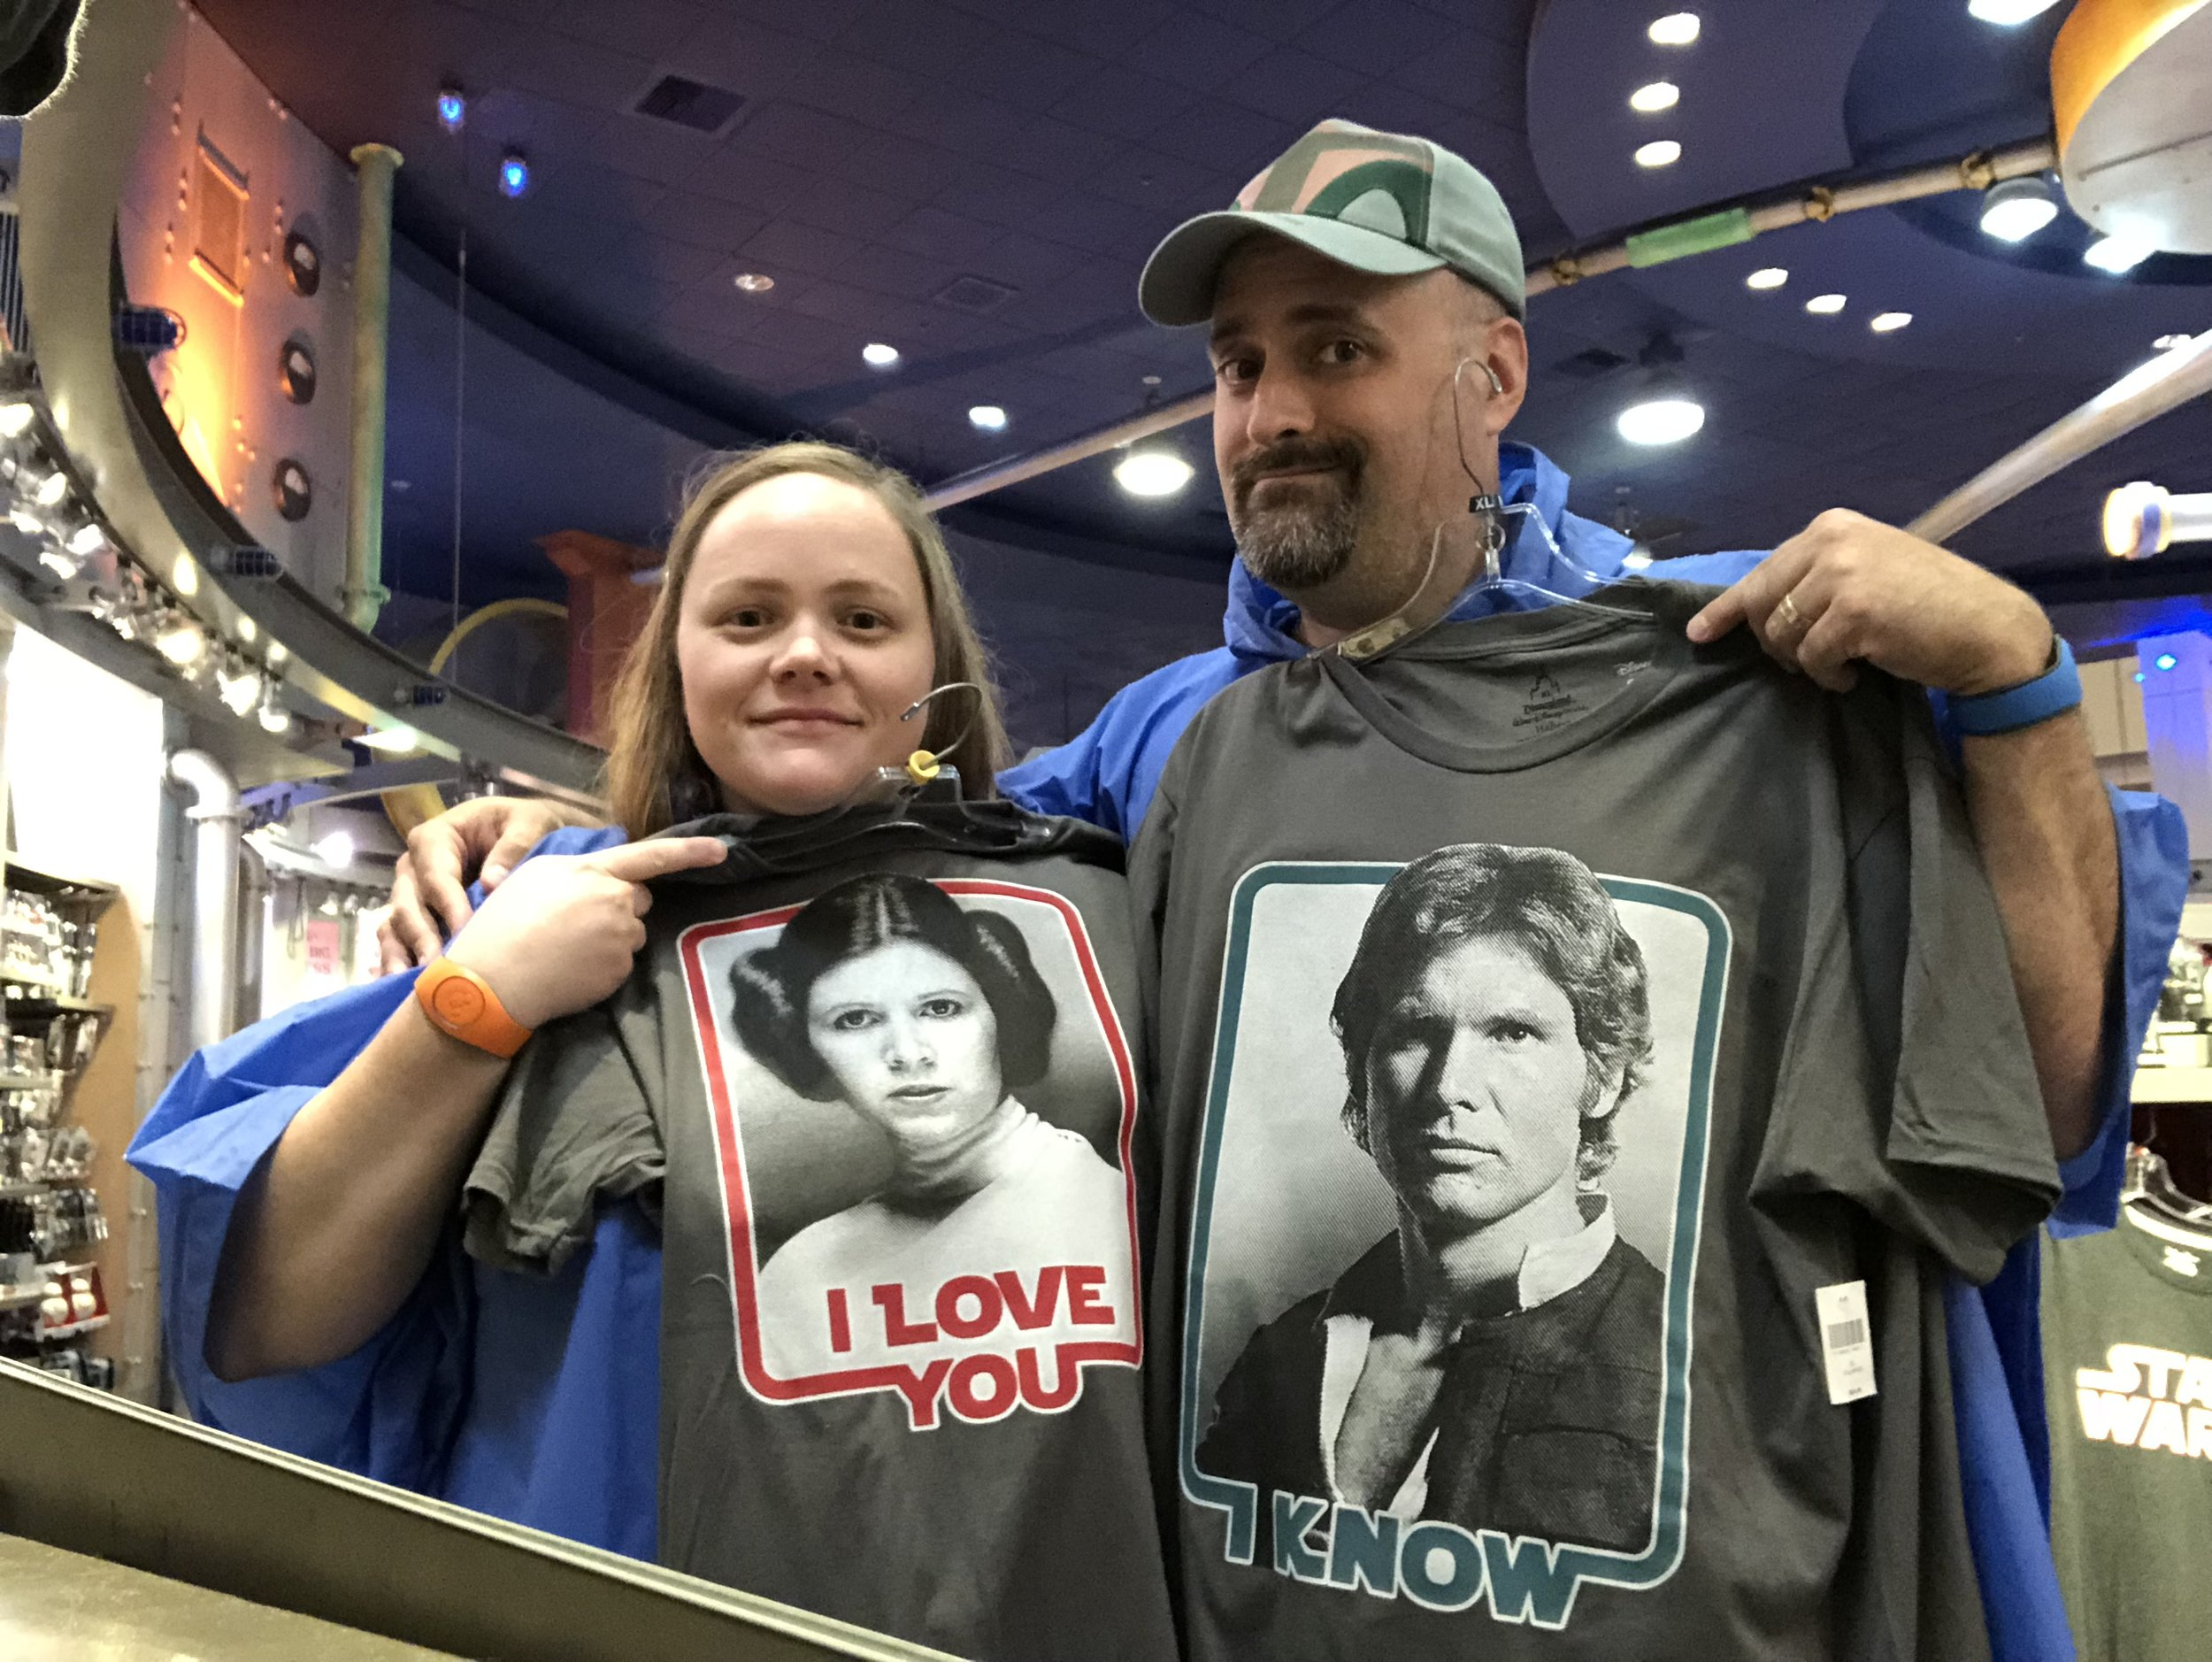 10 us Star Wars shirts.jpg